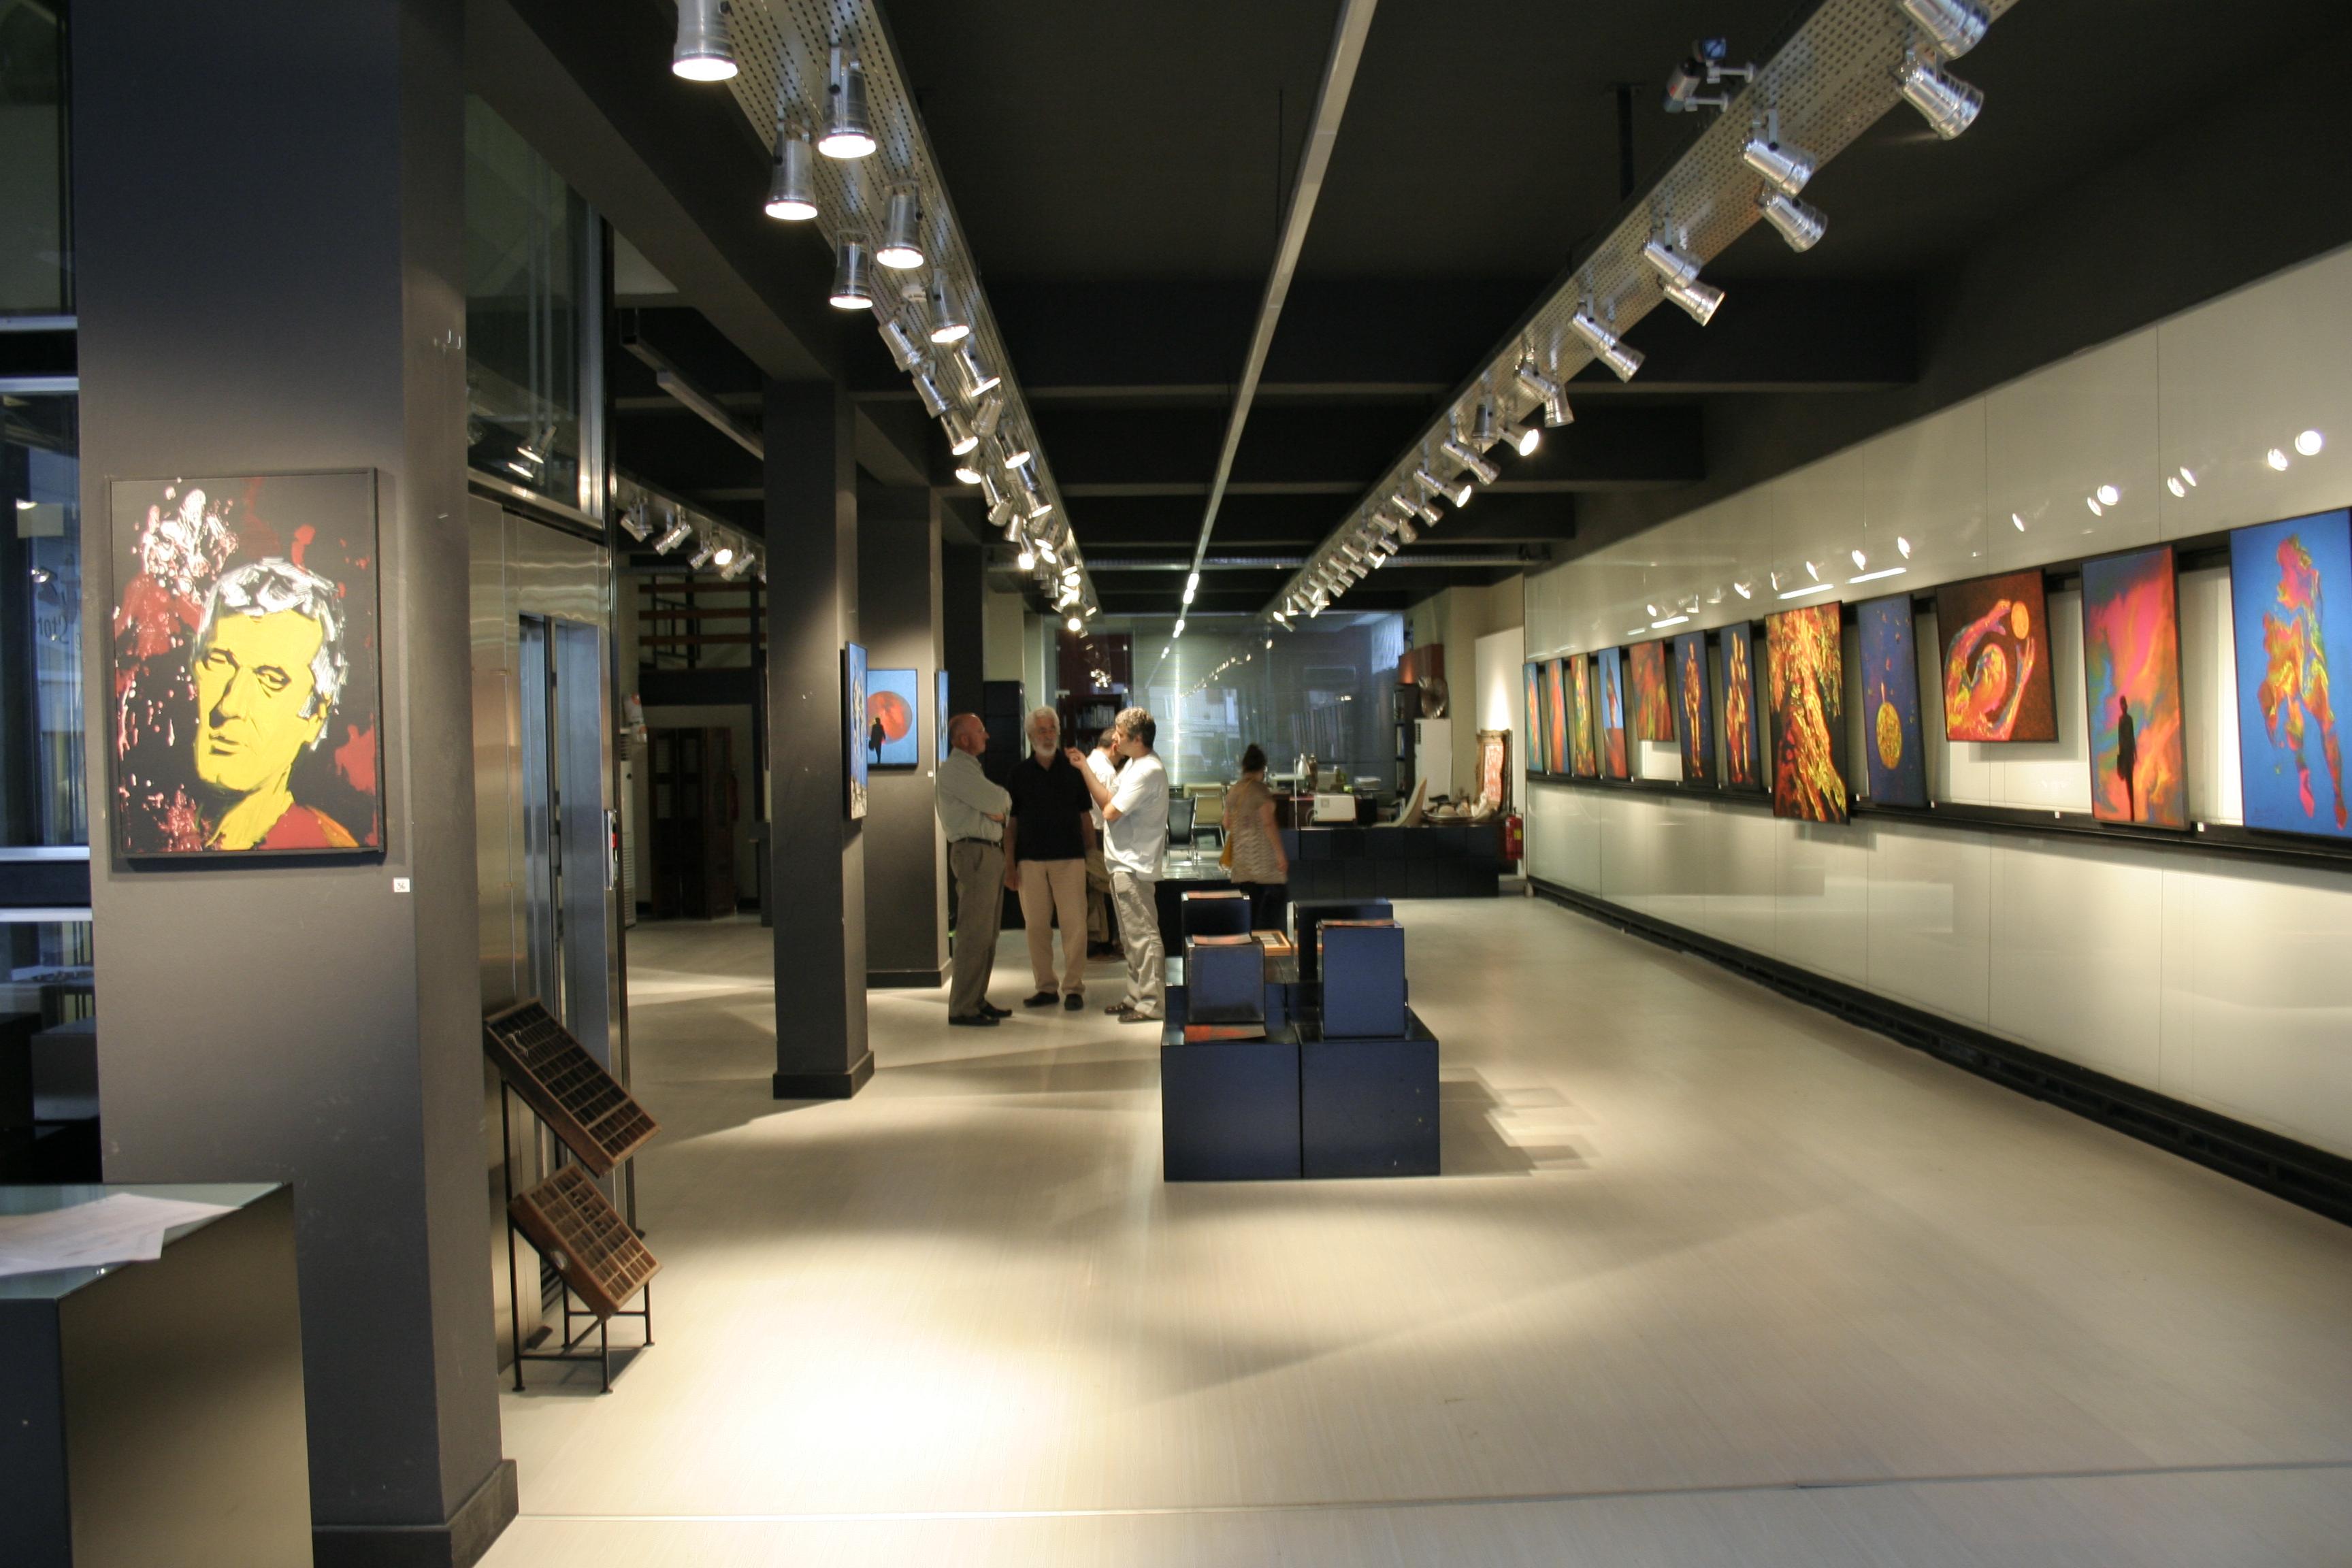 2013, Galerie Alfa3, Heraklion (2)